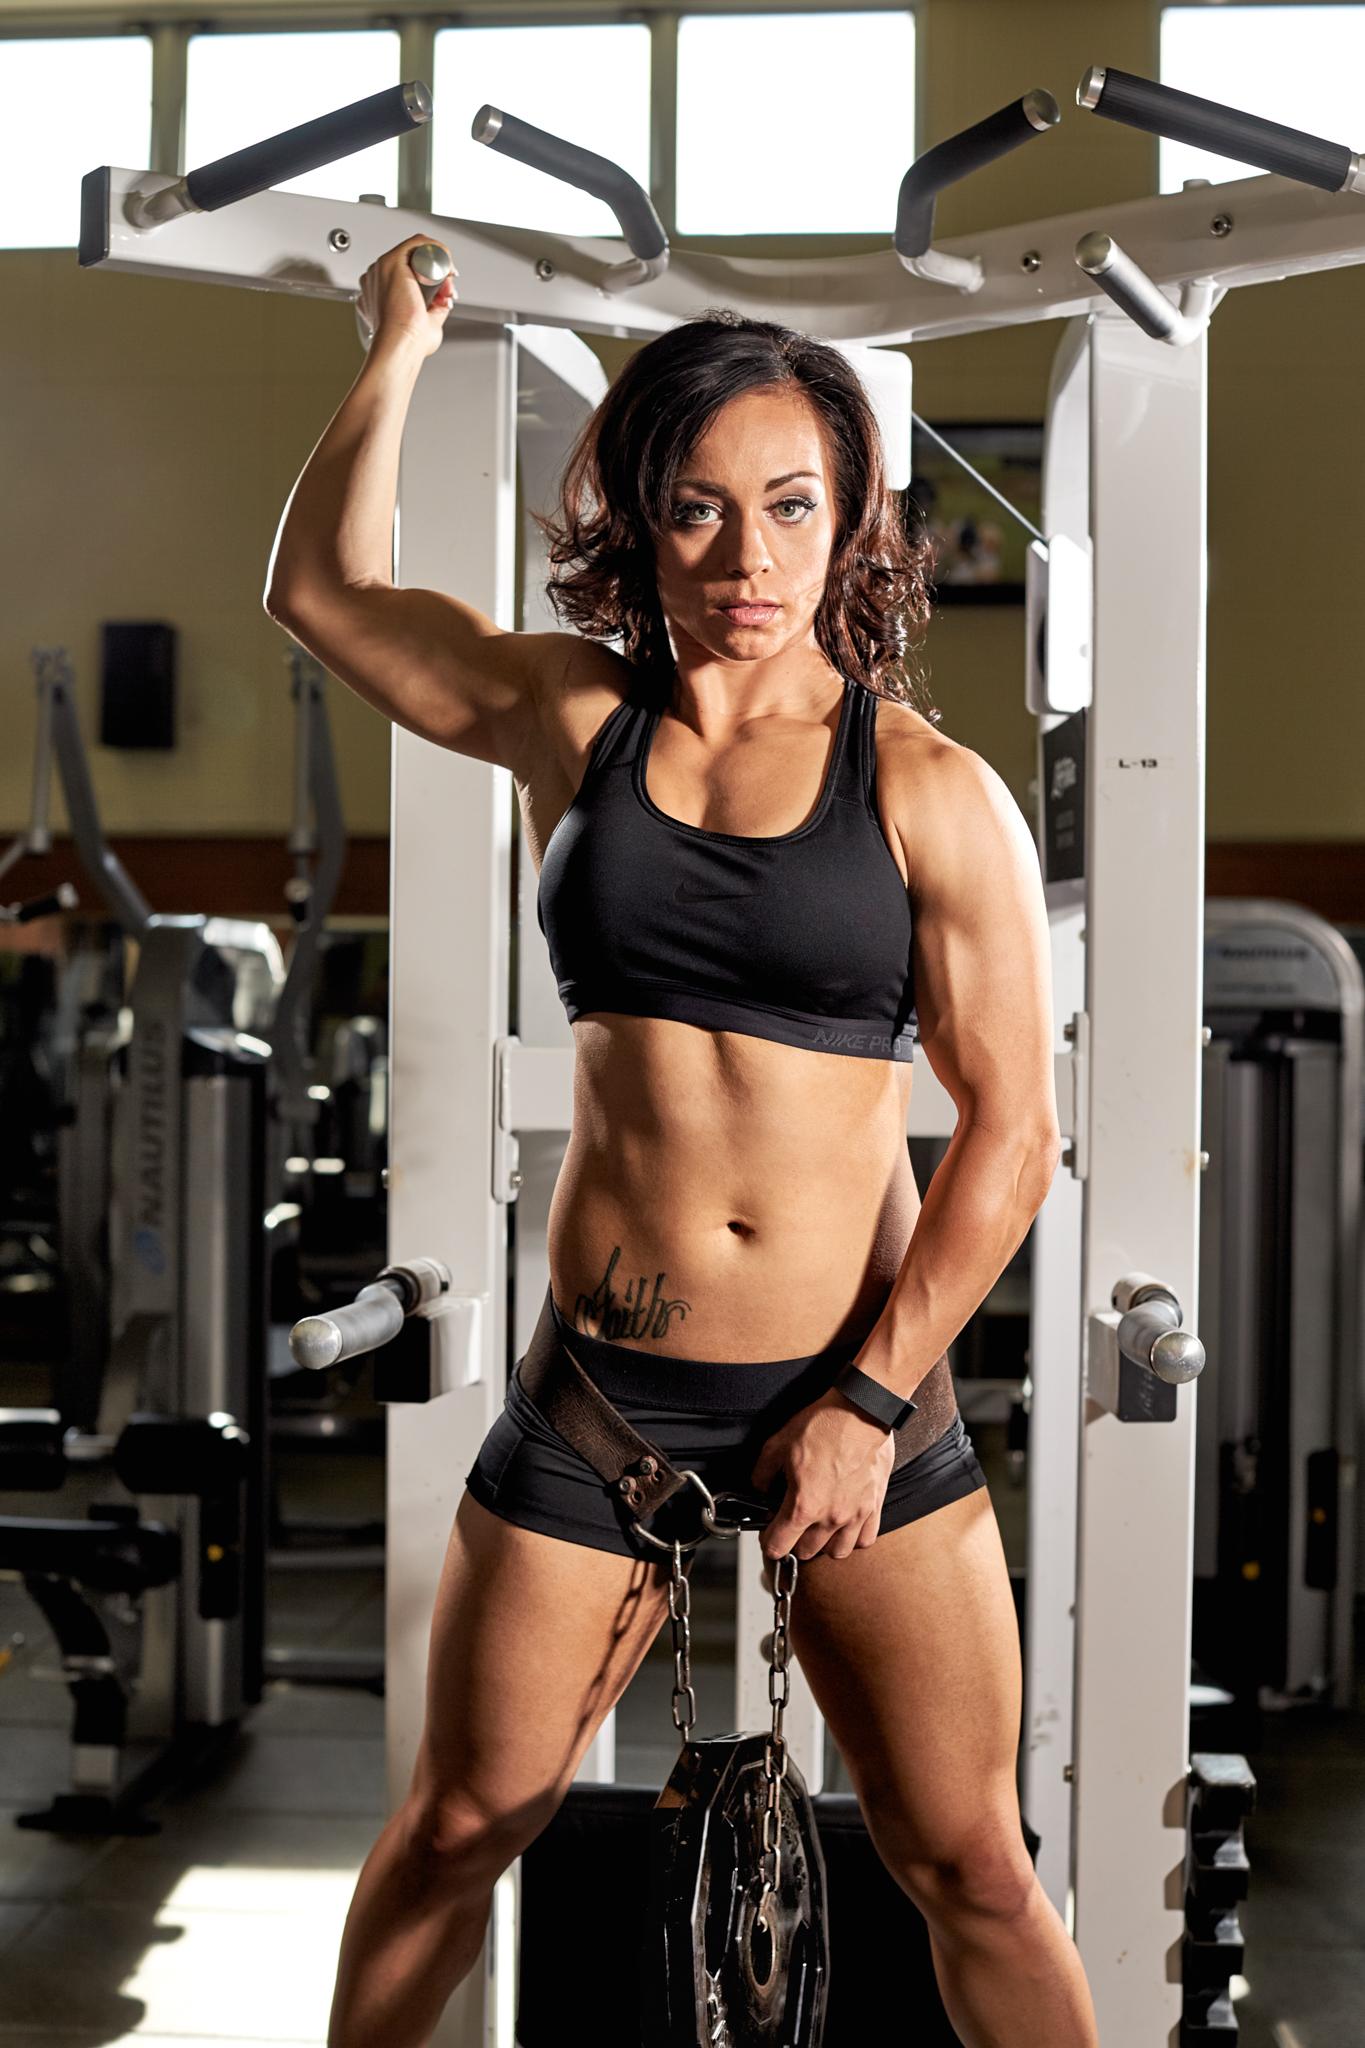 Kayley gym shoot-1440 1.jpg